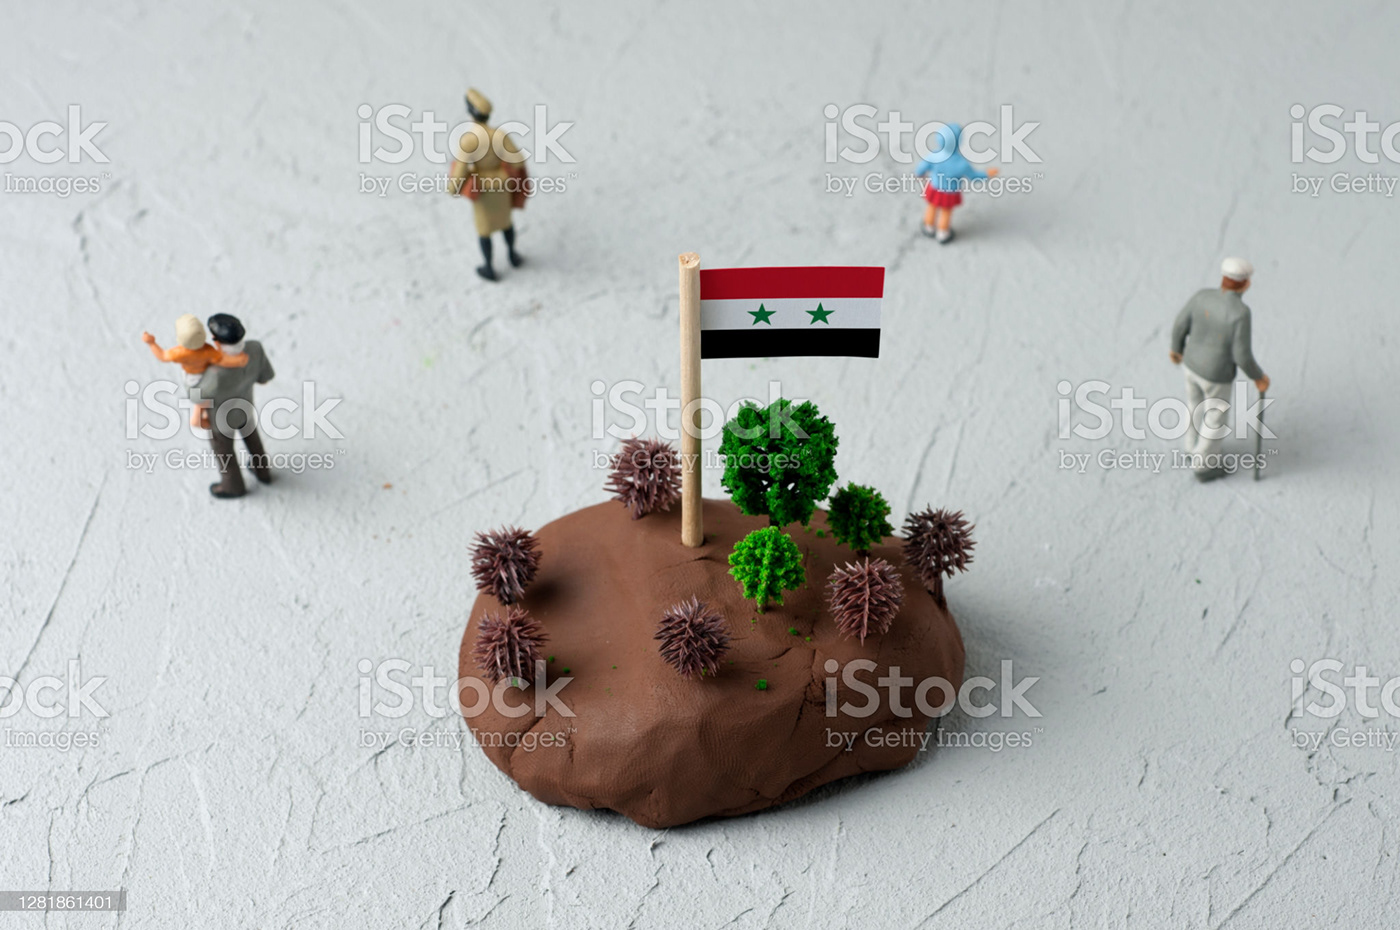 Civil War Diplomacy governments middle east politics refugee sanctions Syria usa War